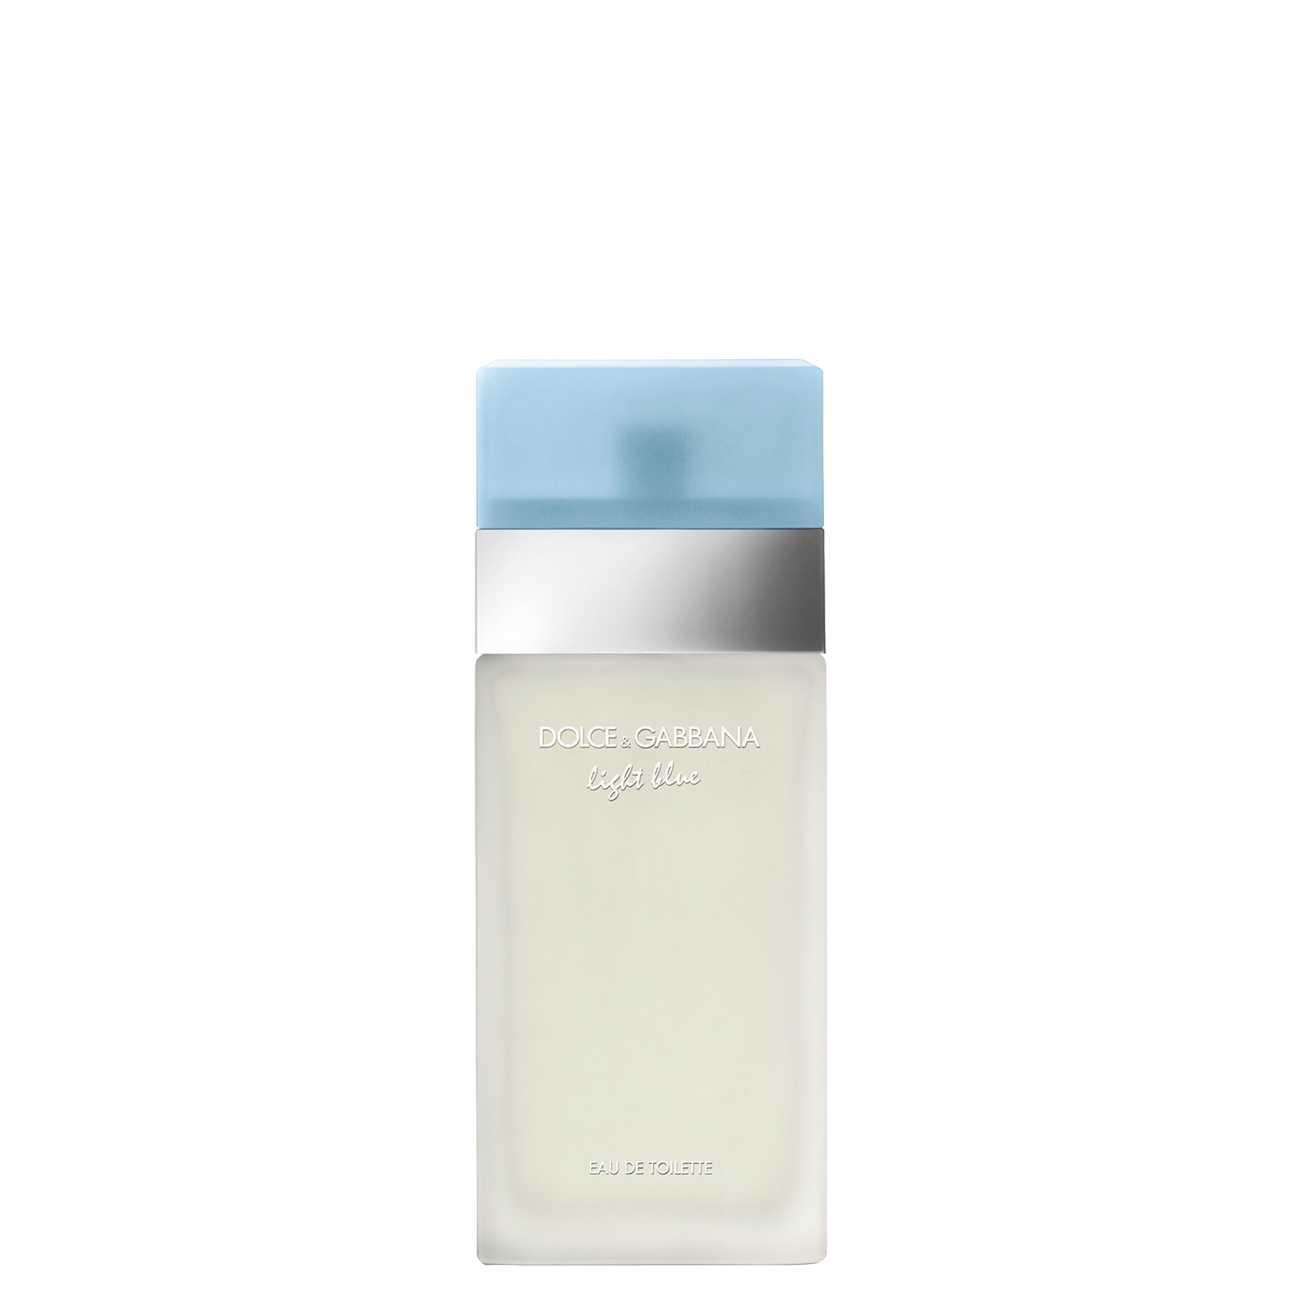 Light Blue 50ml Dolce & Gabbana imagine 2021 bestvalue.eu